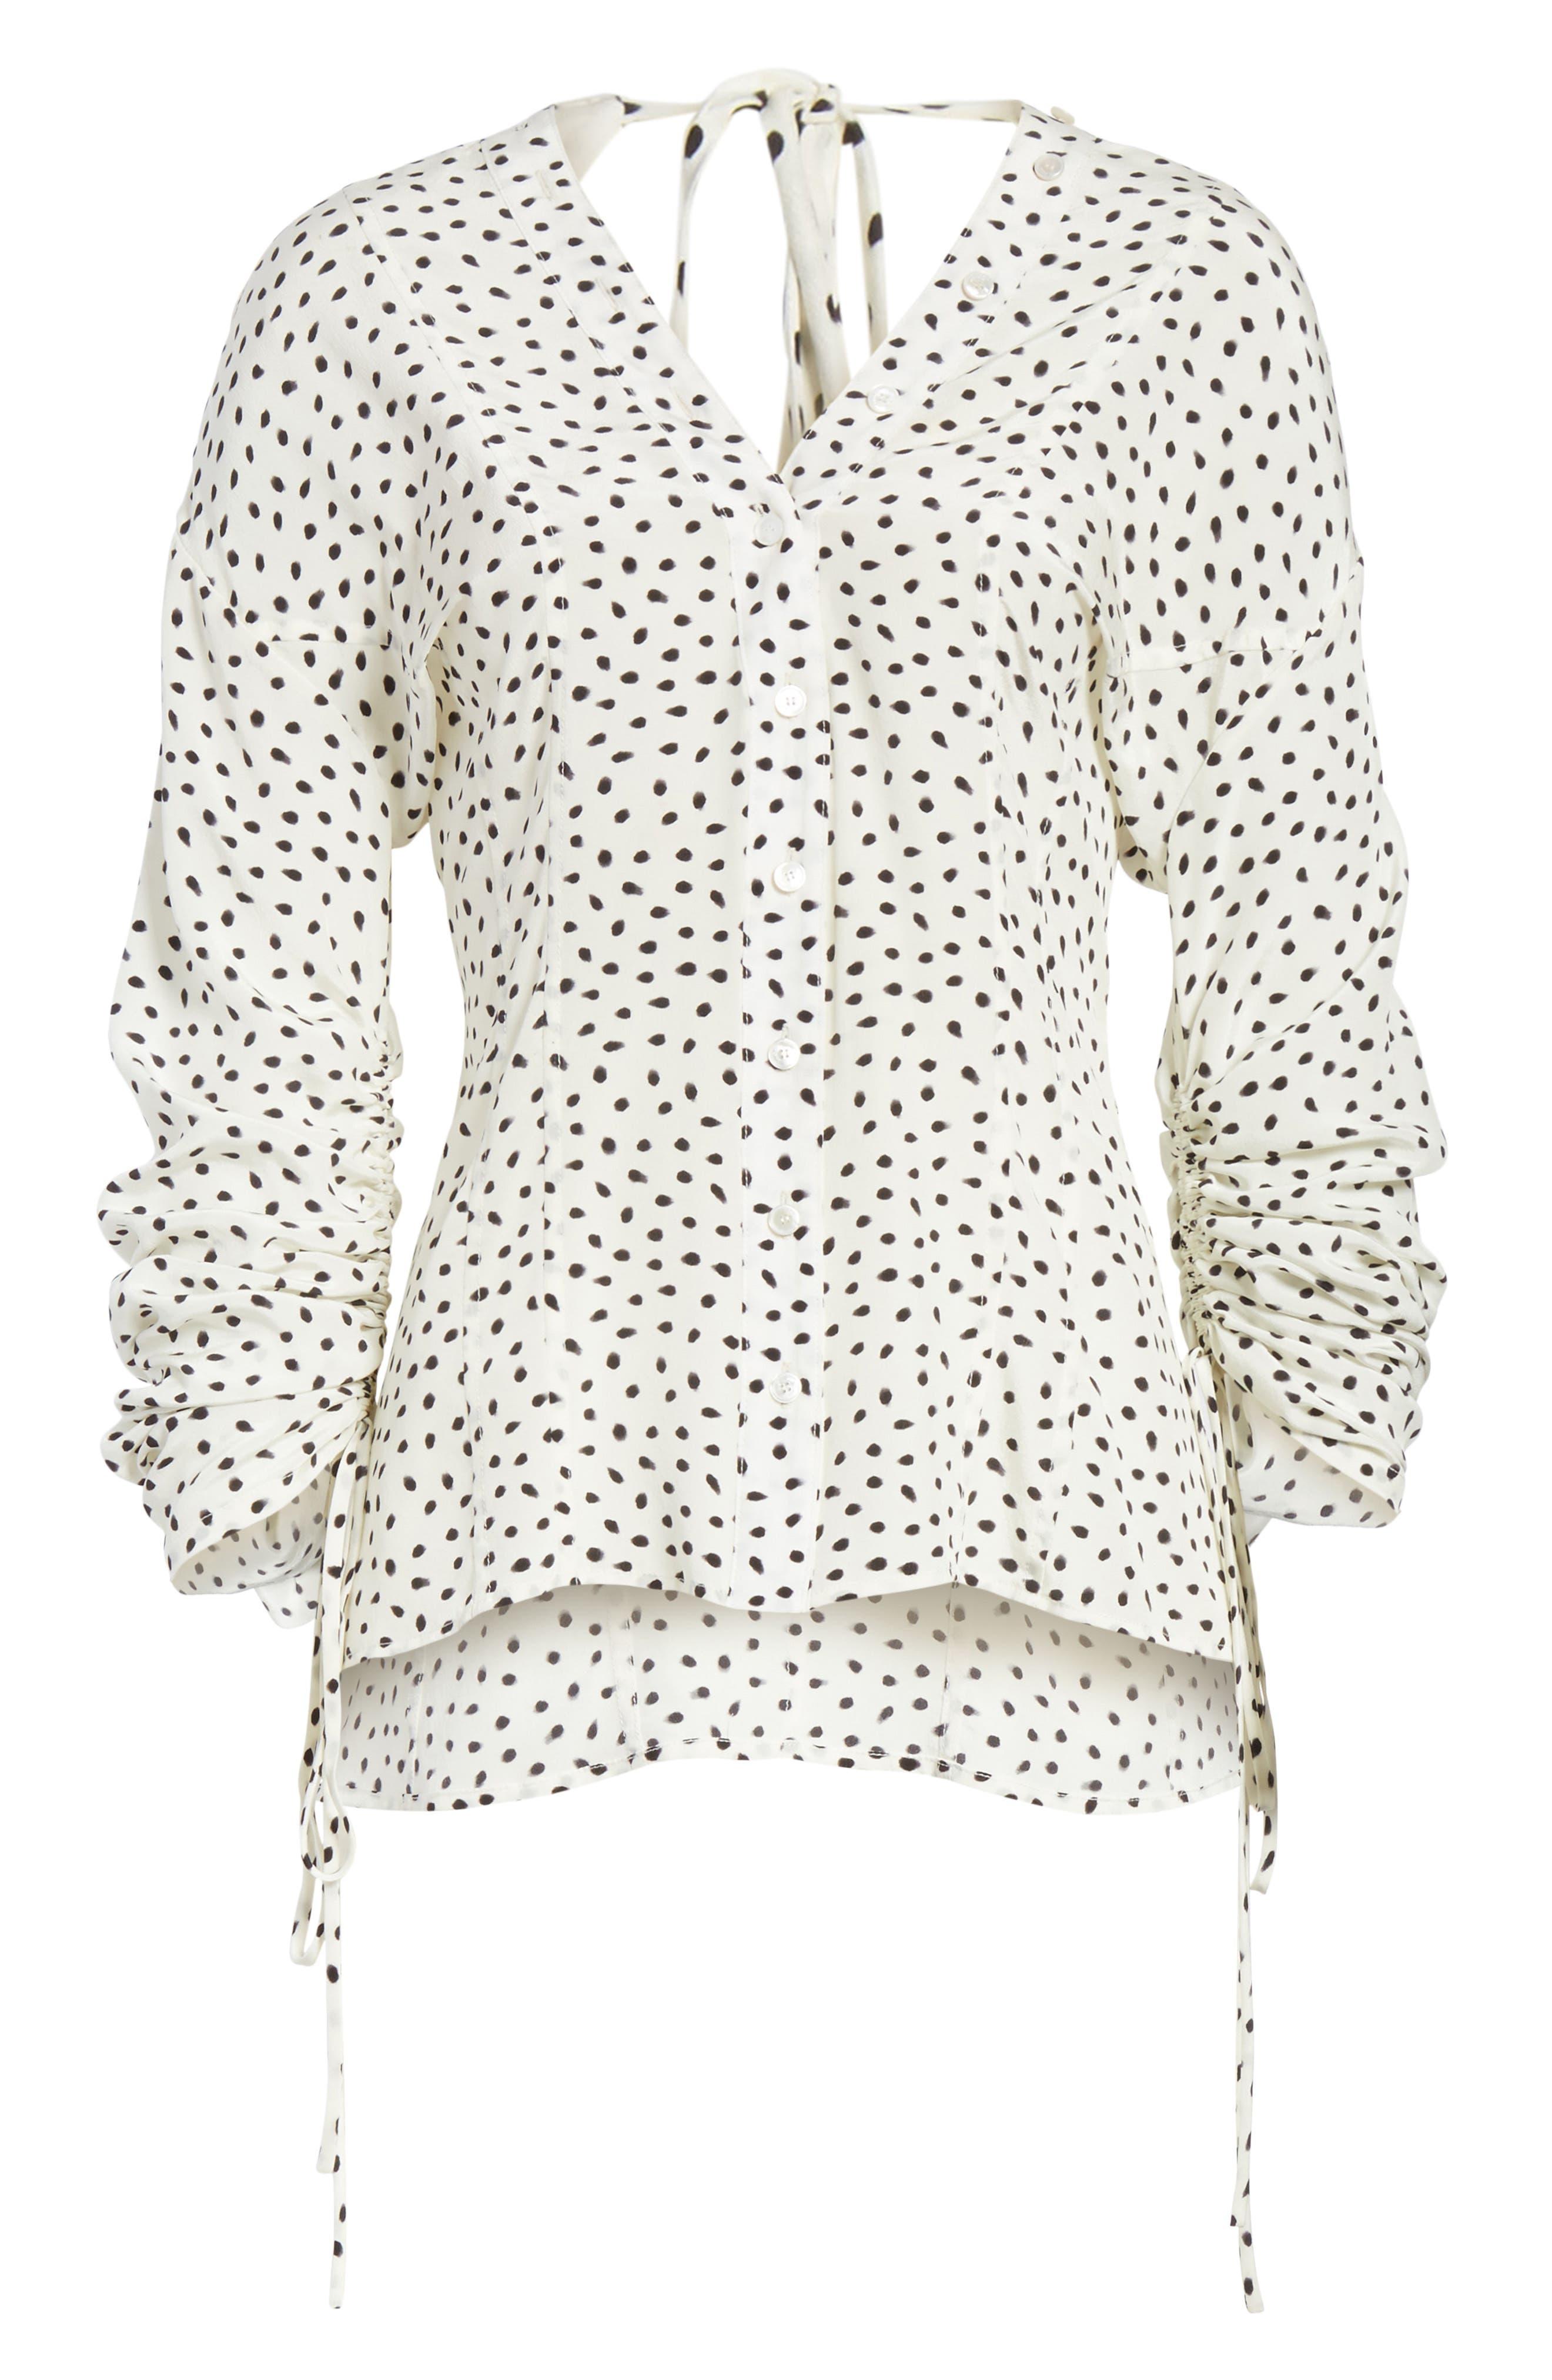 Jason Wu Polka Dot Ruched Sleeve Silk Shirt,                             Alternate thumbnail 6, color,                             903